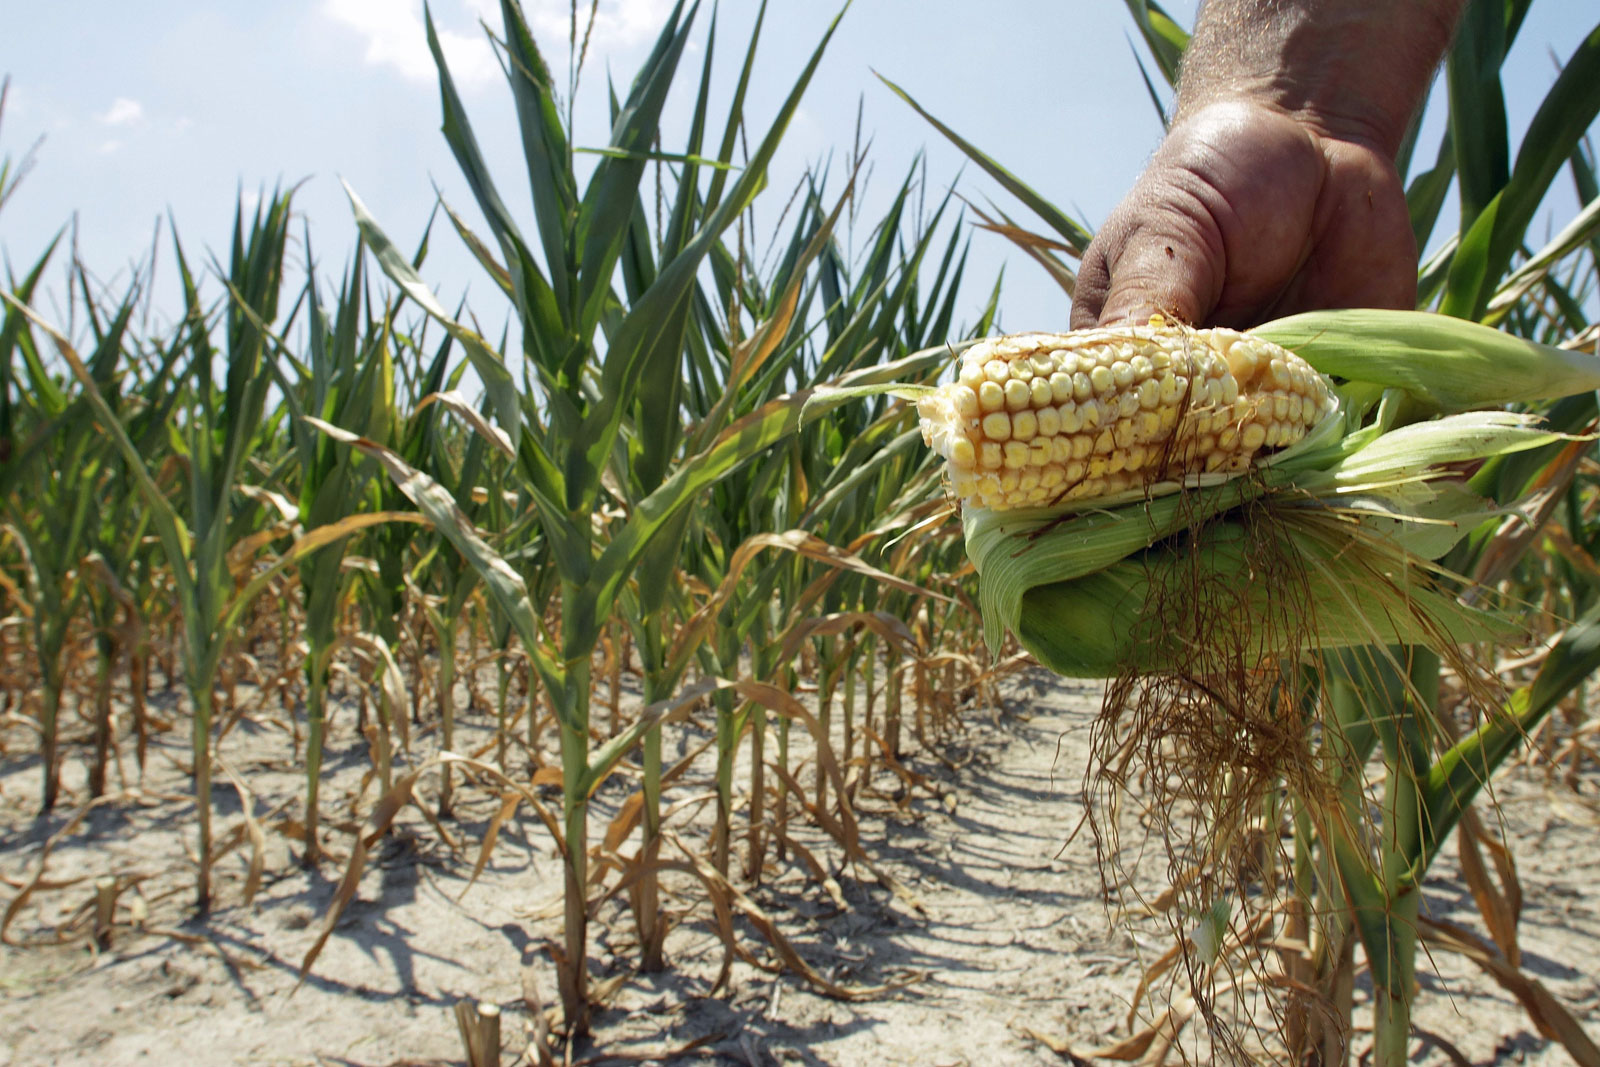 Boicot contra maiz gringo